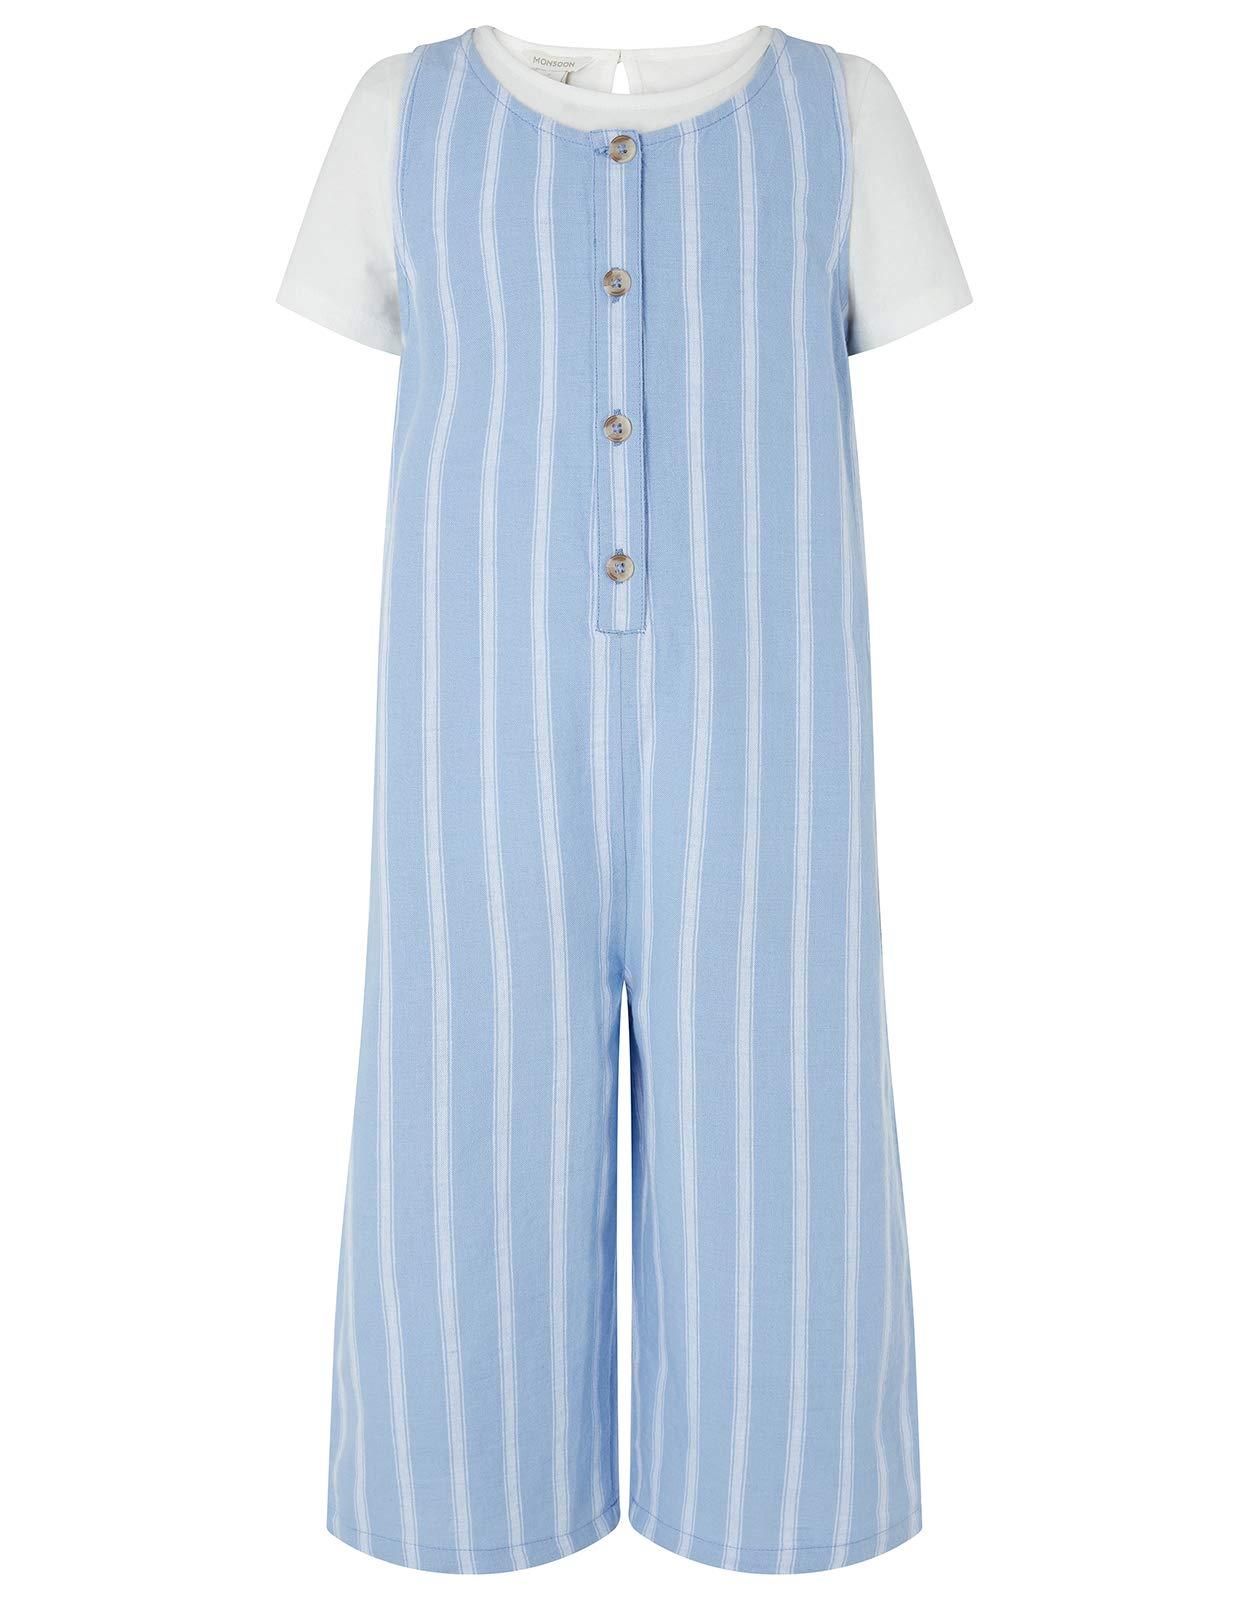 Monsoon Linen Blend Peta Romper & T-Shirt Daywear Sets - Girls - 9 Years Navy by Monsoon (Image #1)